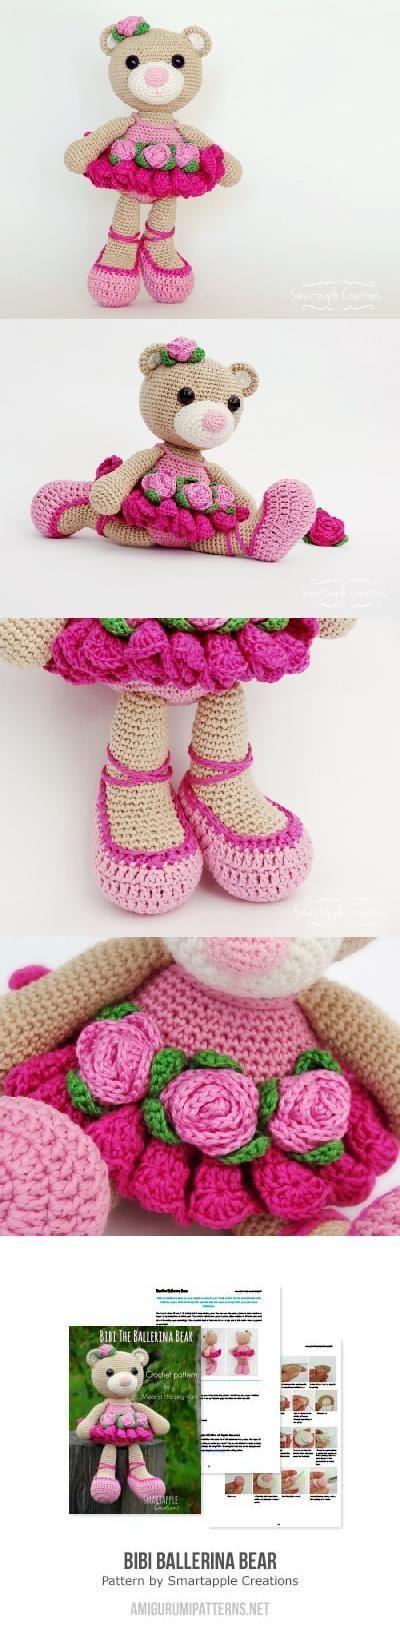 106 besten Crochet and Knitting Patterns For Toys Bilder auf ...